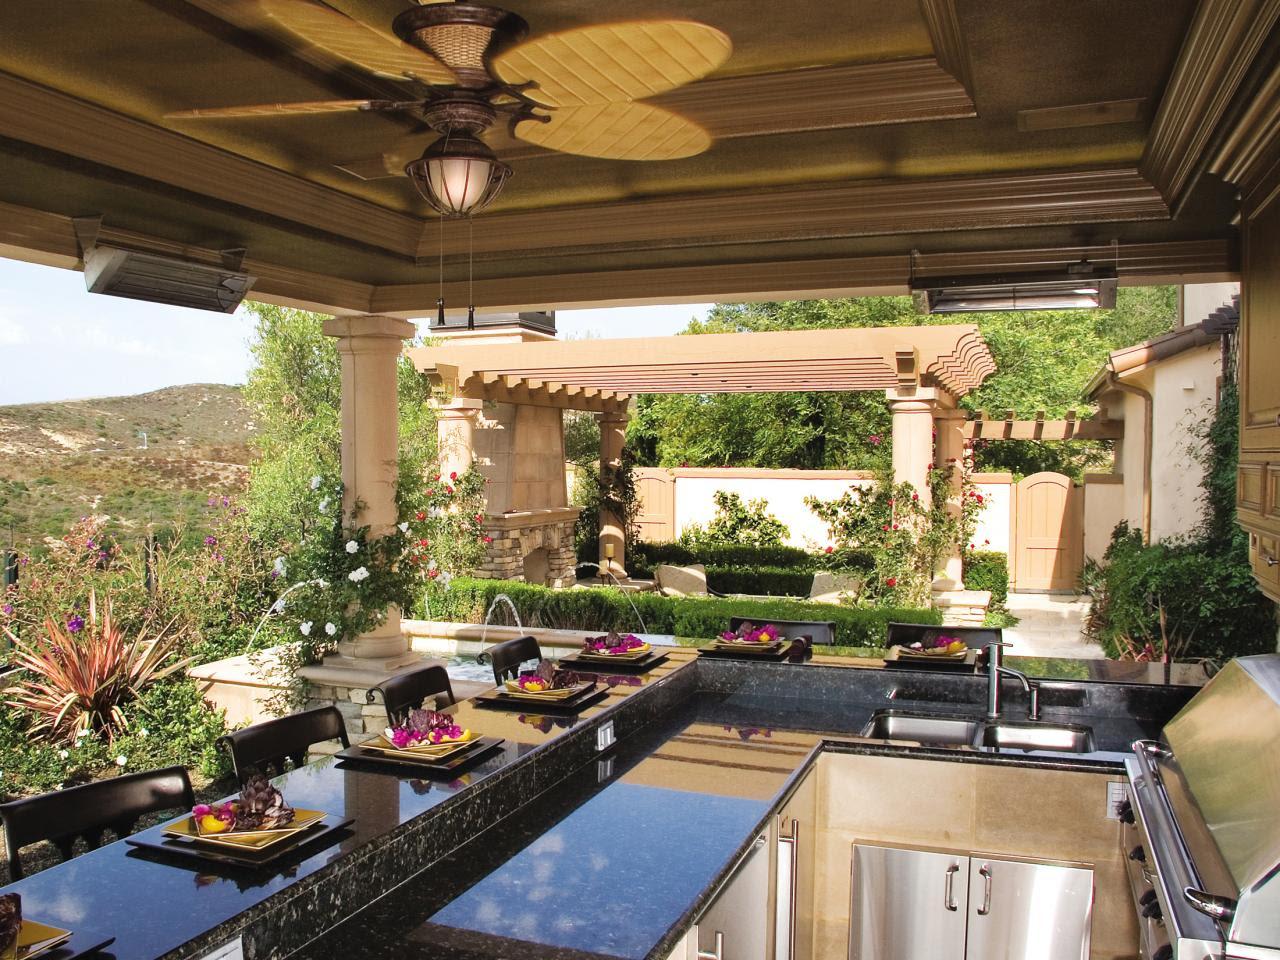 Outdoor Kitchen Countertops Options | HGTV